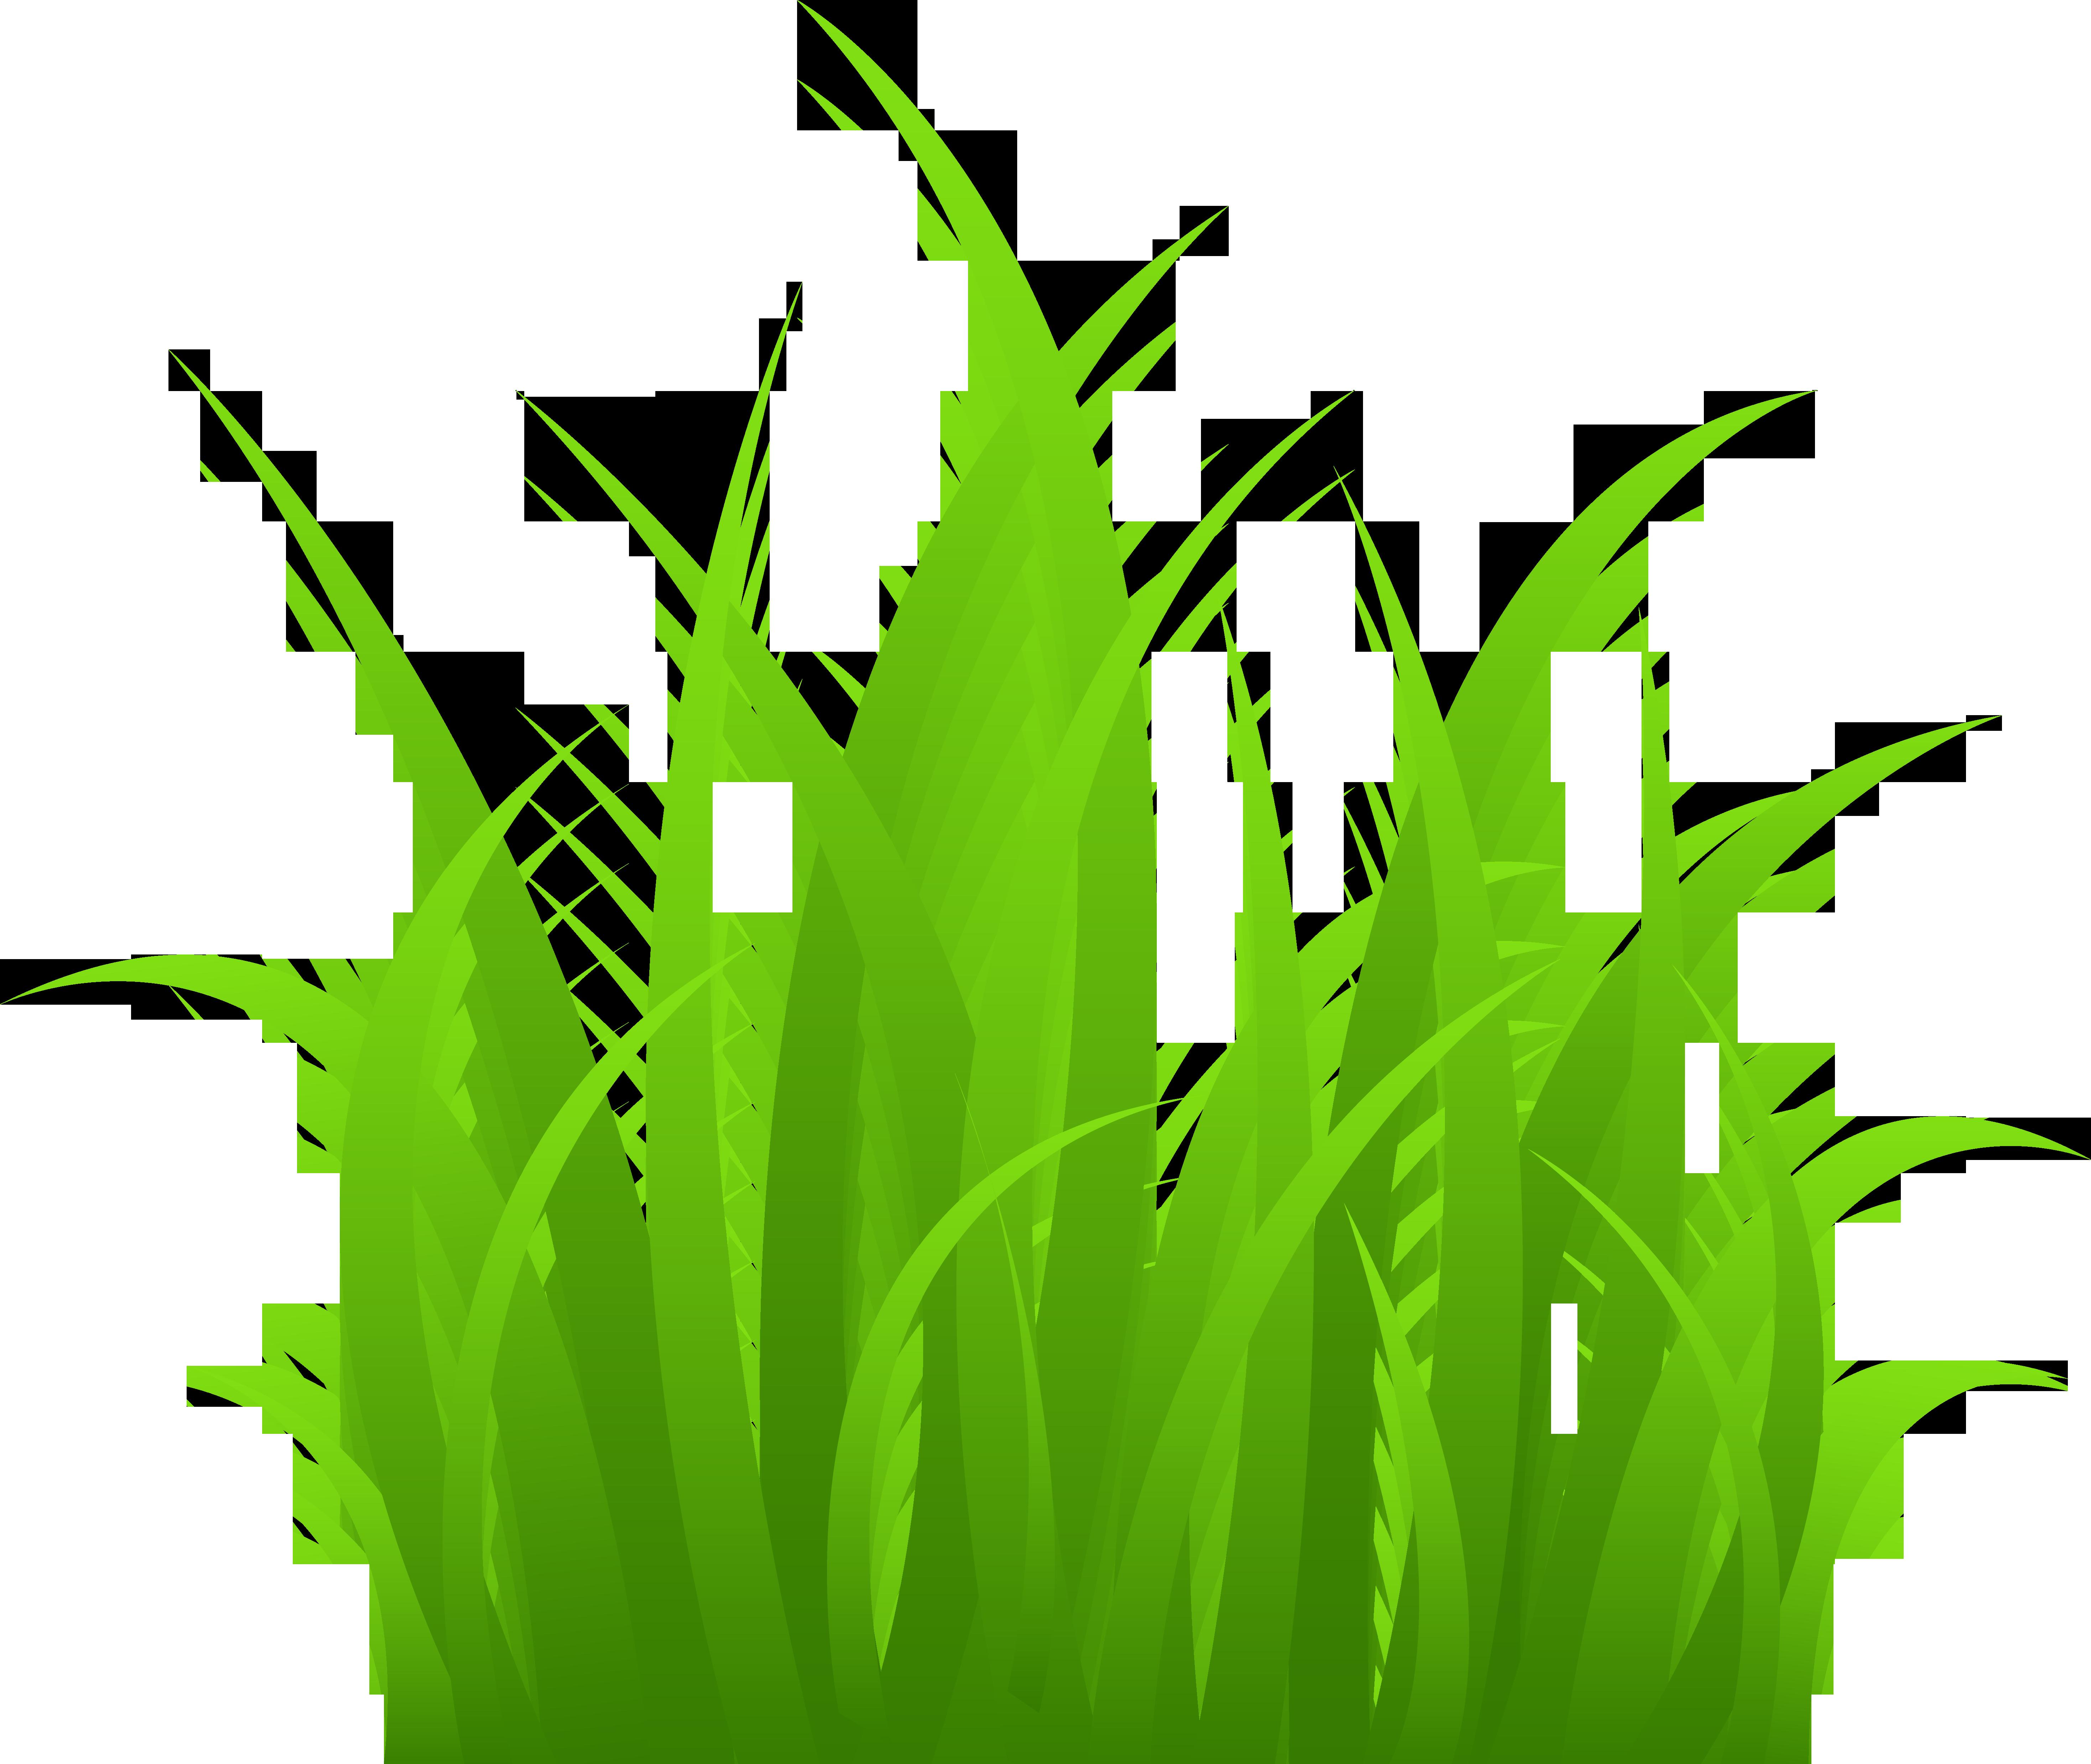 Grass graphic clipart banner free stock Grass graphic clipart - ClipartFest banner free stock